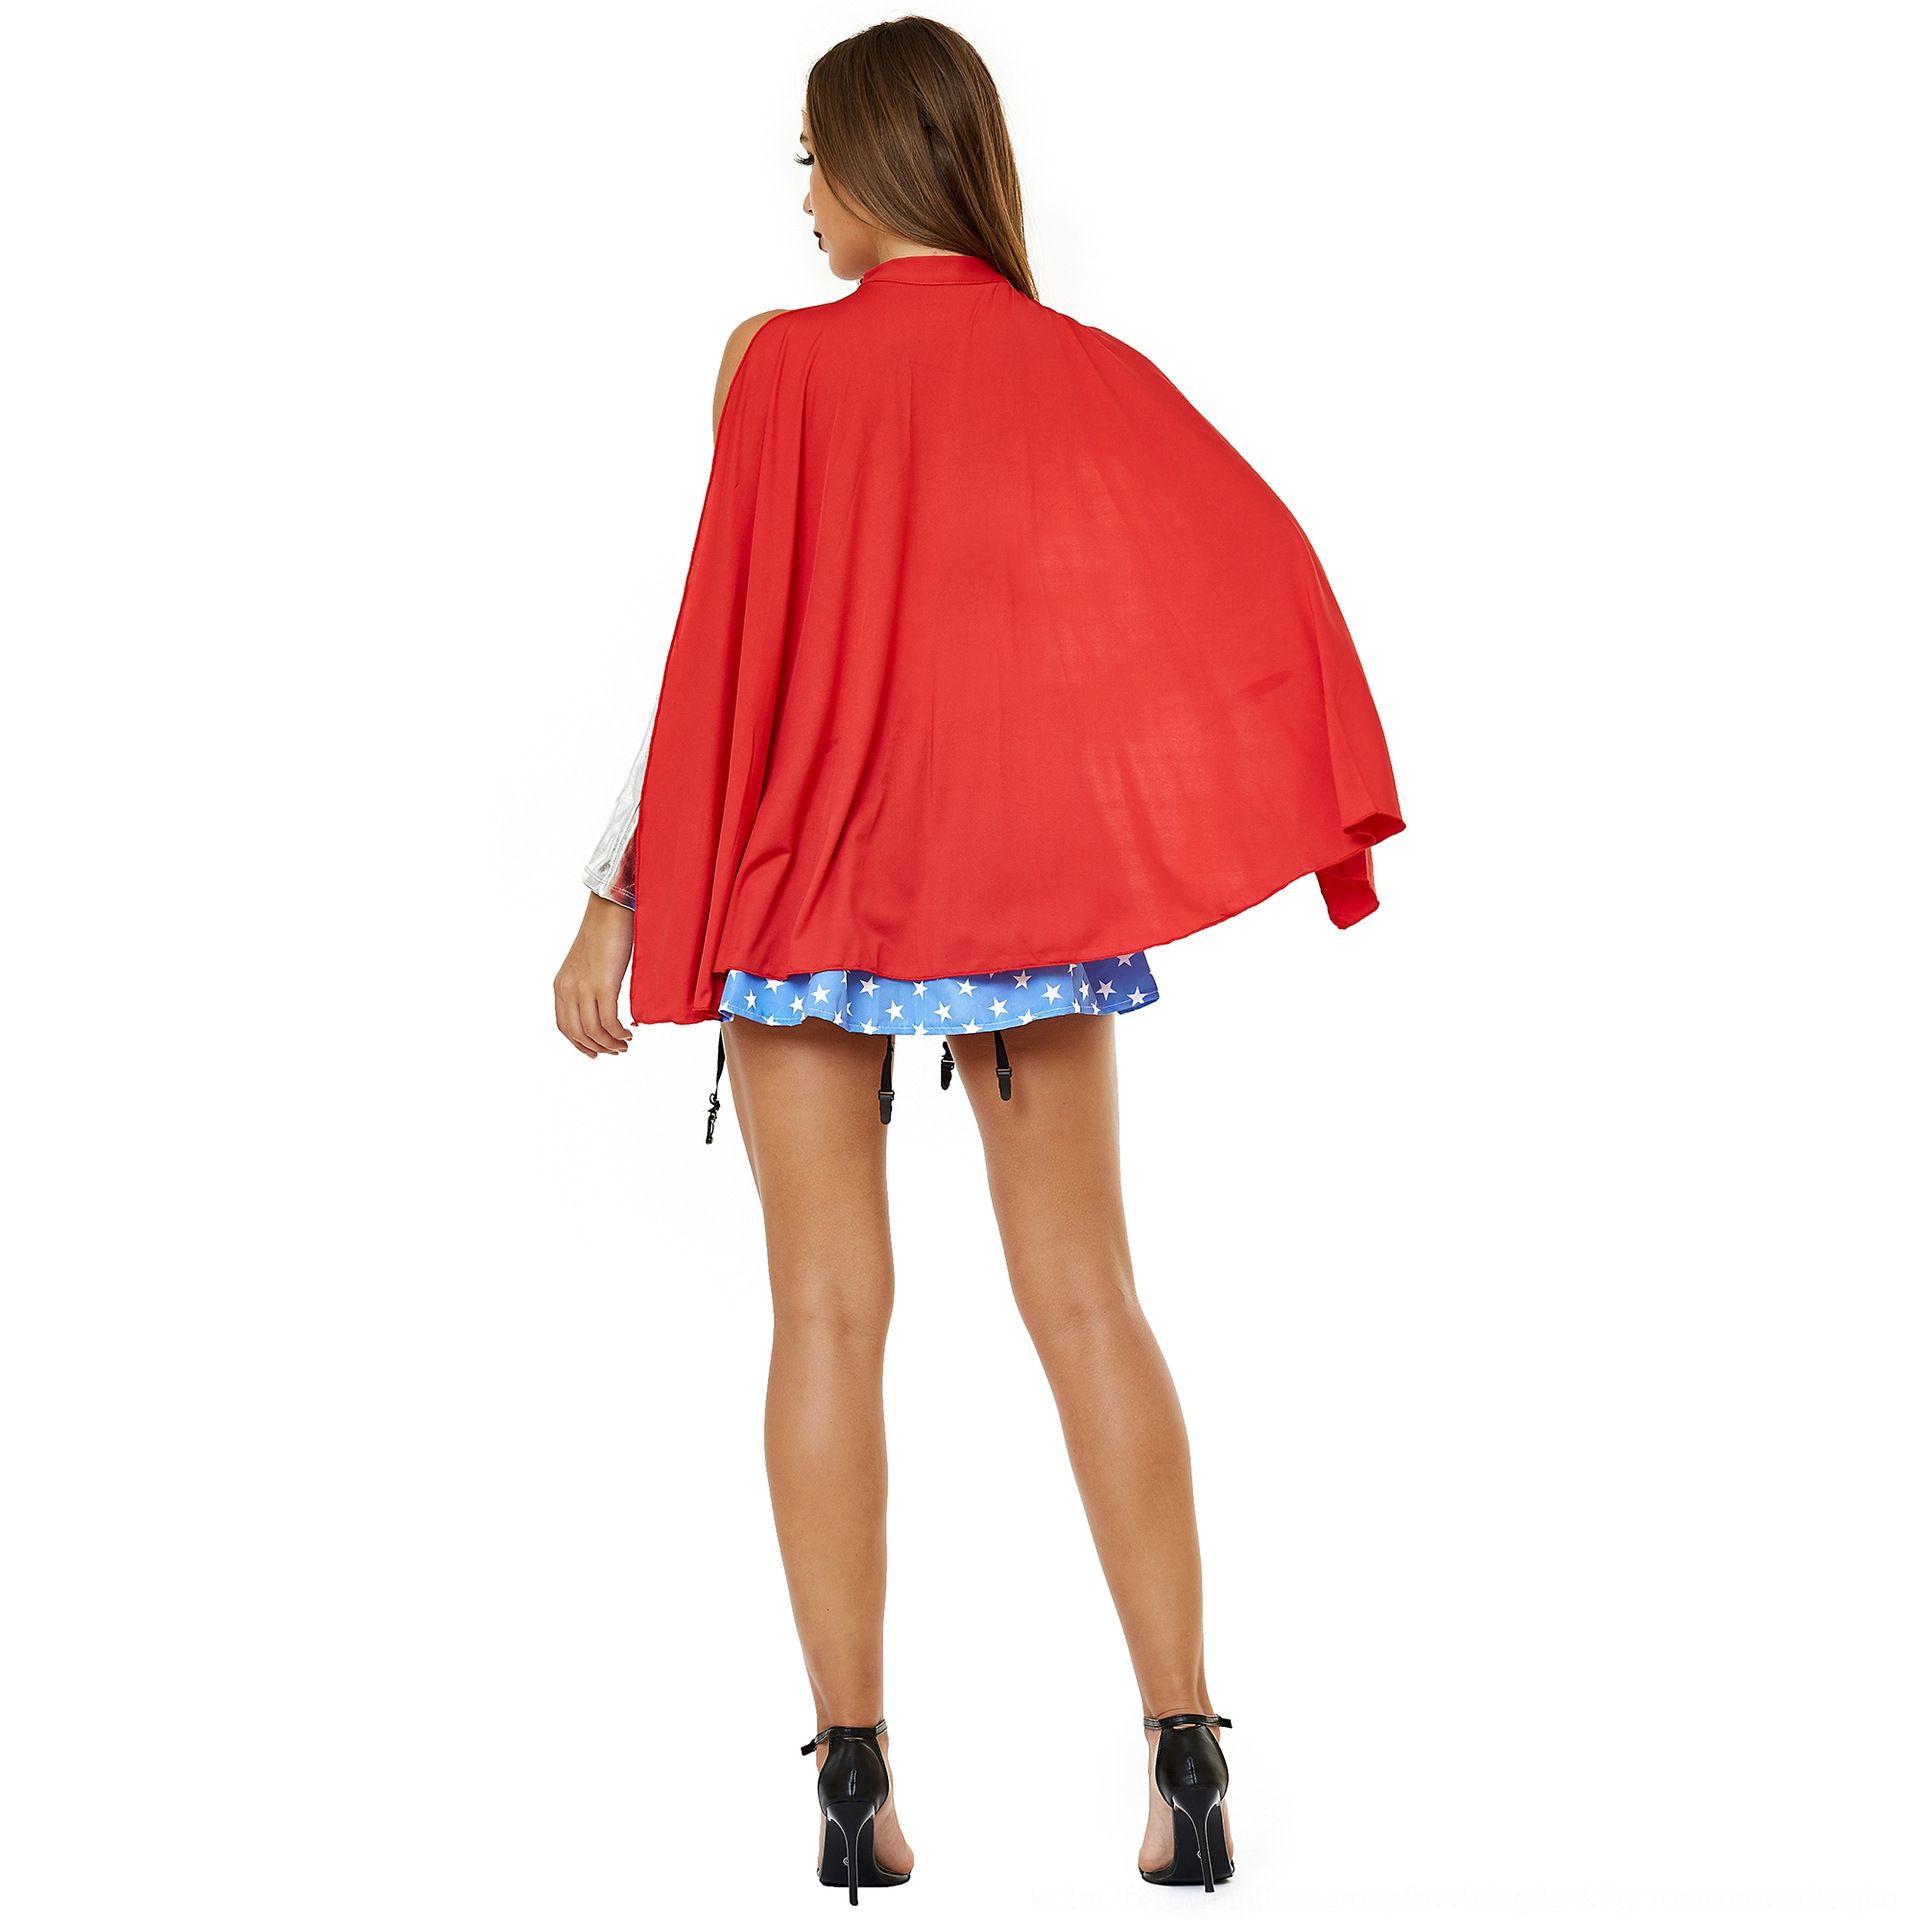 M-XXL clothing role playing Wonder Woman uniform cosplay lady Halloween Superman costume M-XXL clothing role playing Wonder Woman uniform co